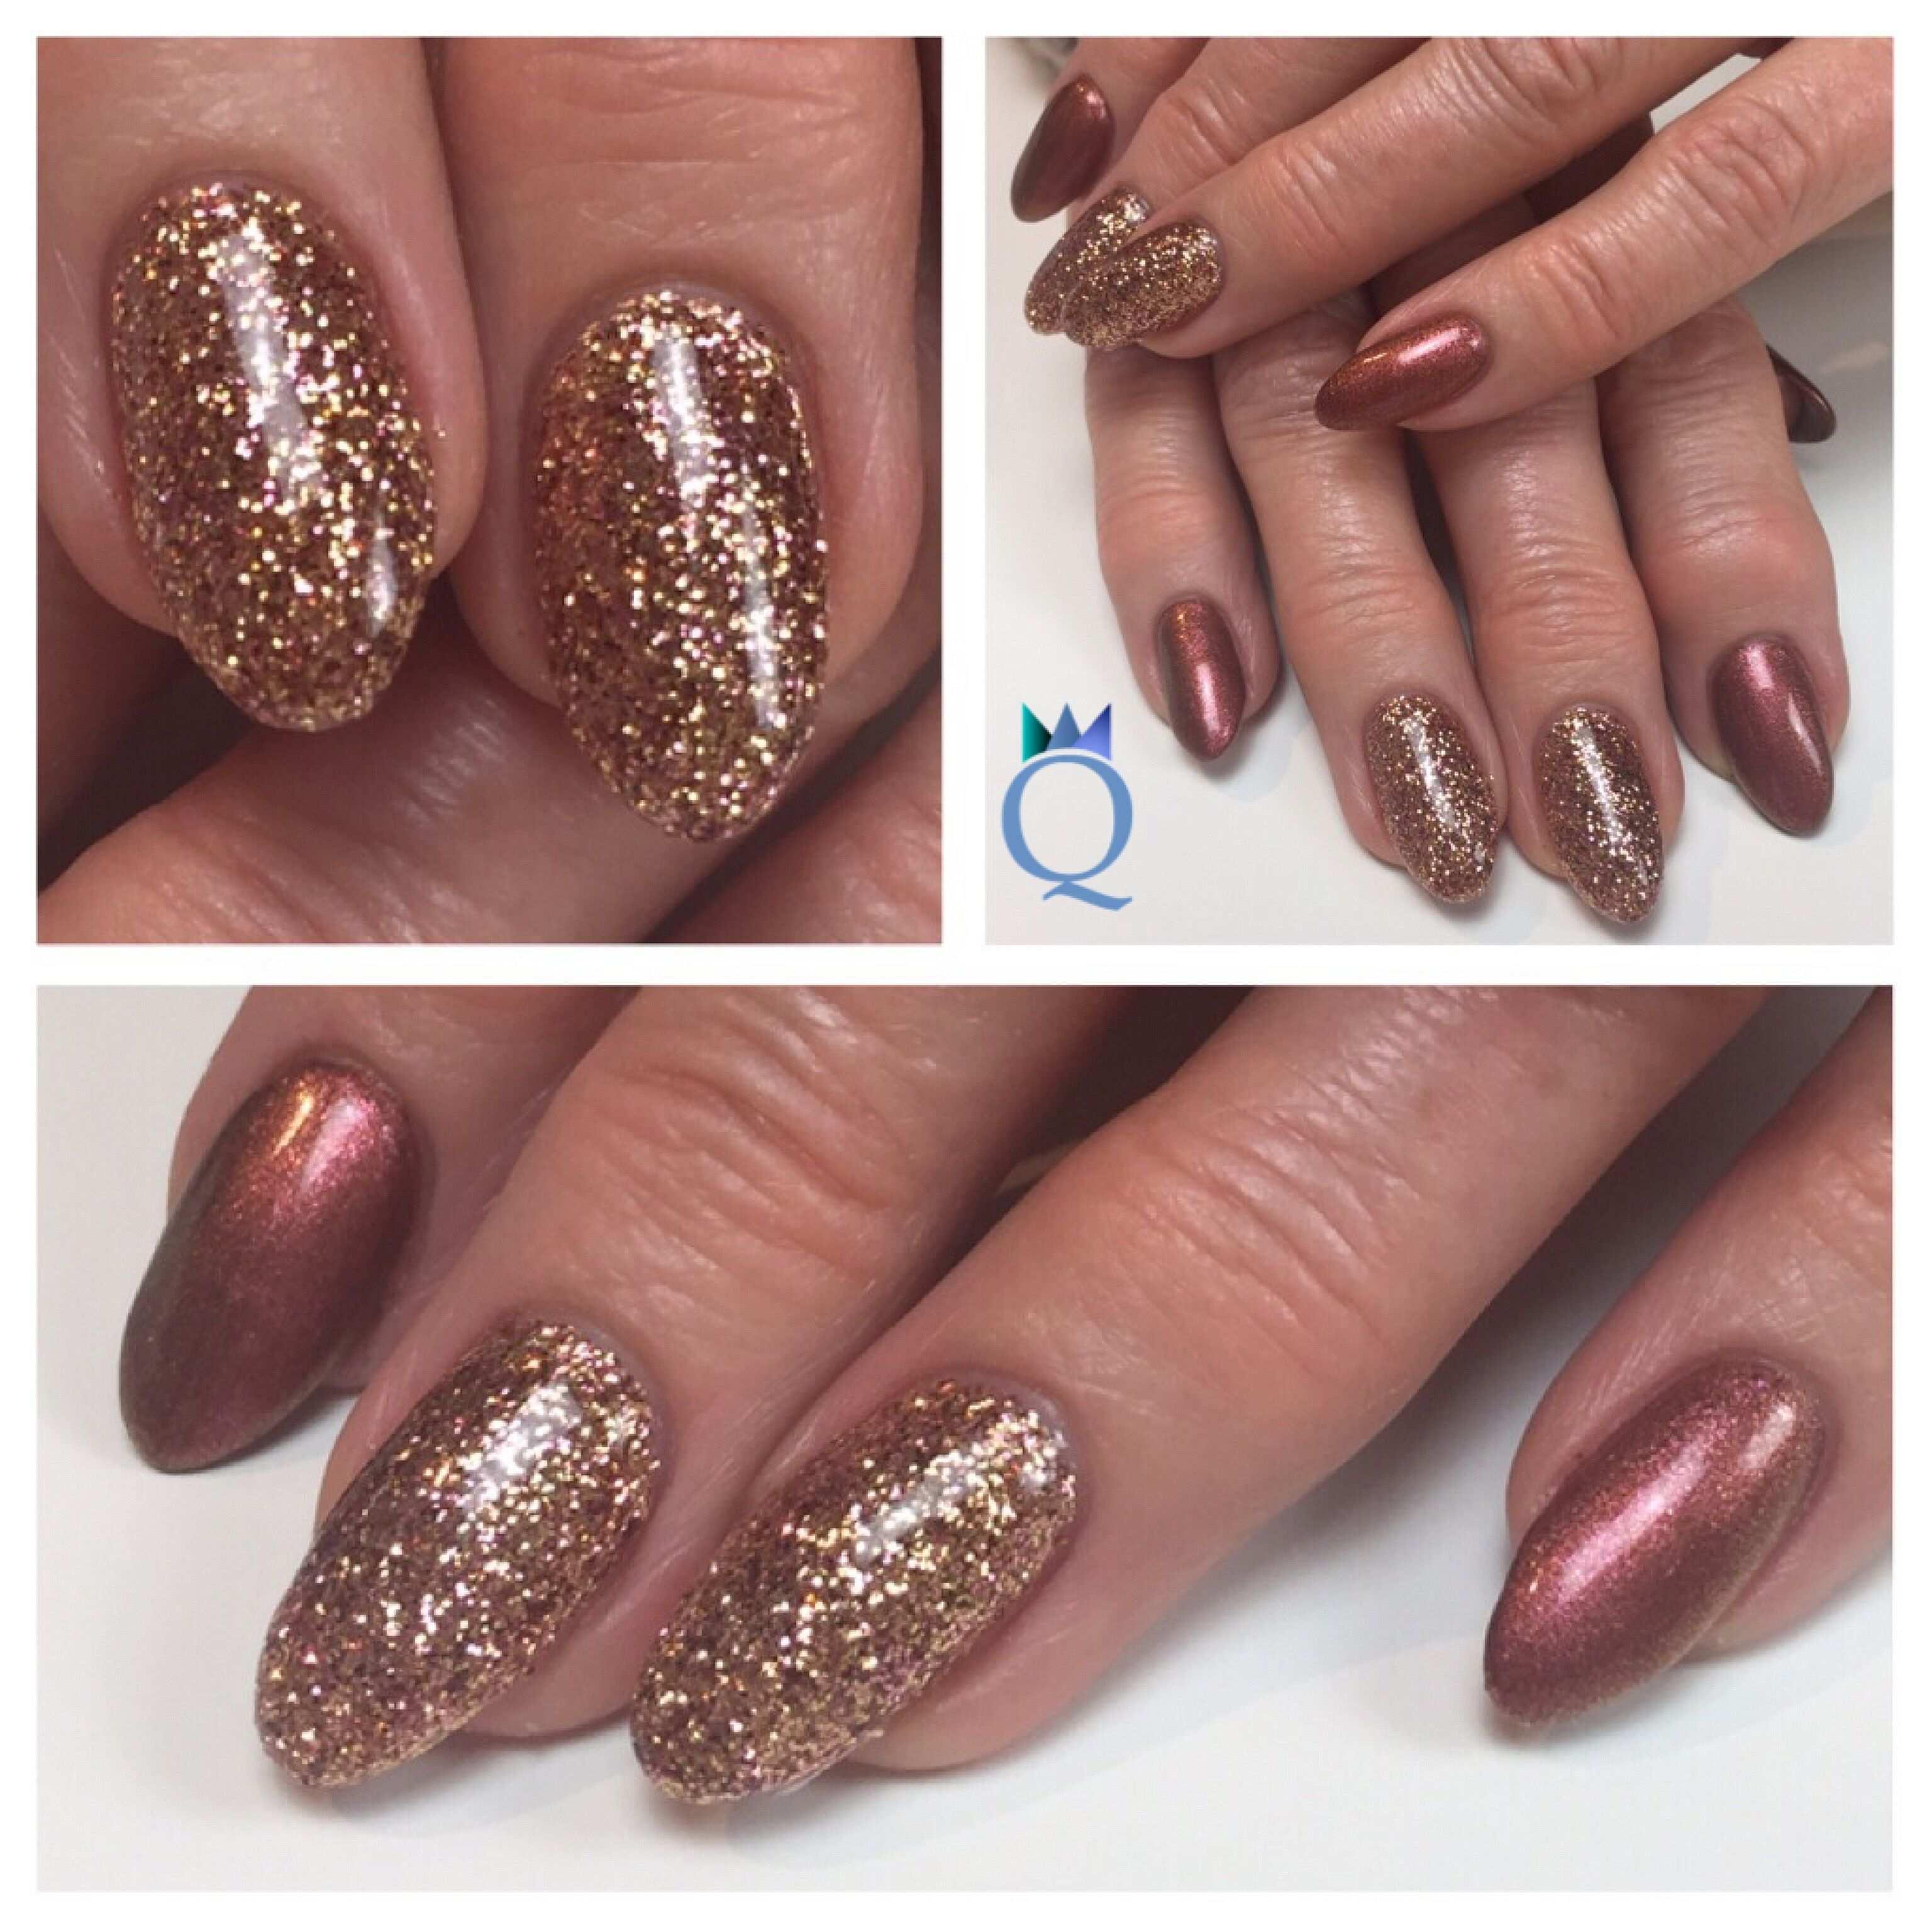 Almondnails Gelnails Nails Rosegold Glitter Red Copper Mandelform Gelnagel Nagel Rosegold Glitzer Rot Kupfer Nagels Nails Nail Art Acrylic Nails